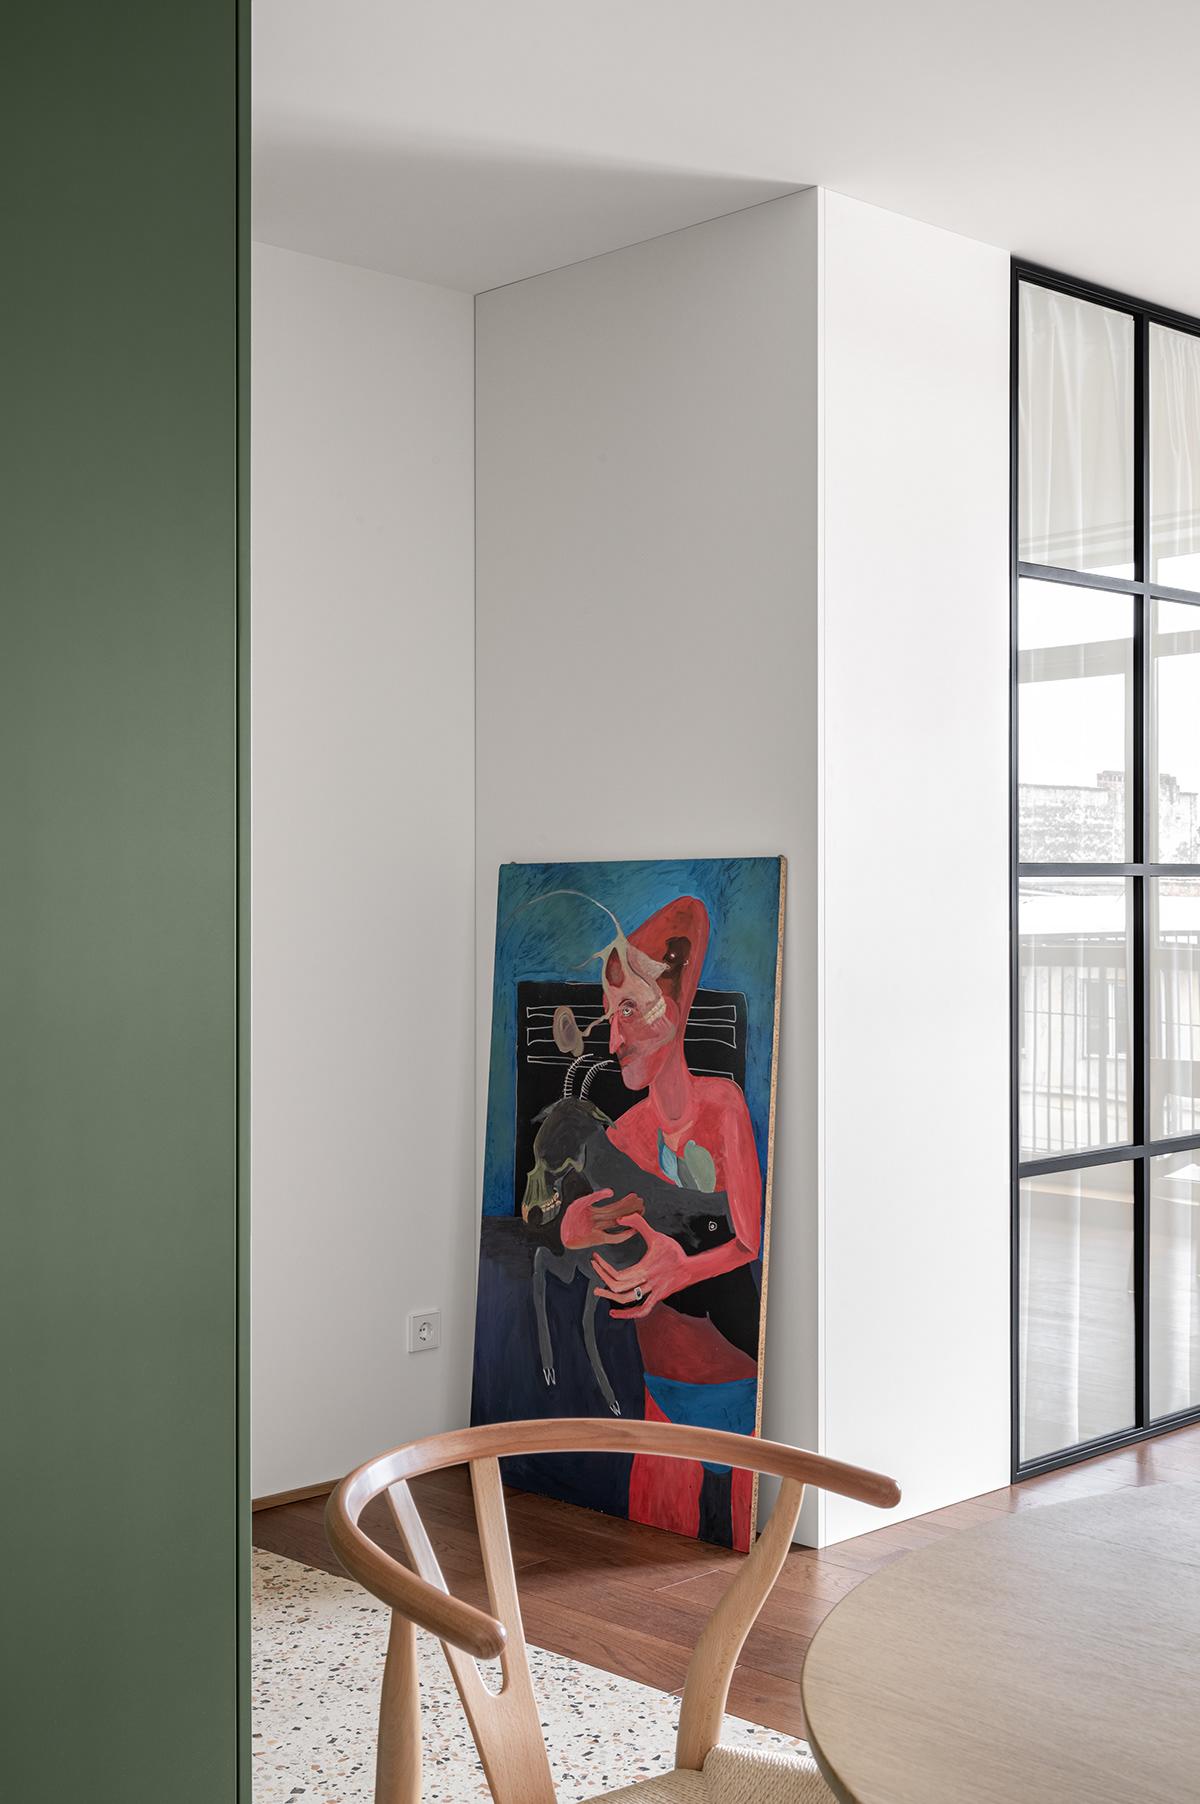 apartment clean design green Interior minimal residential simple